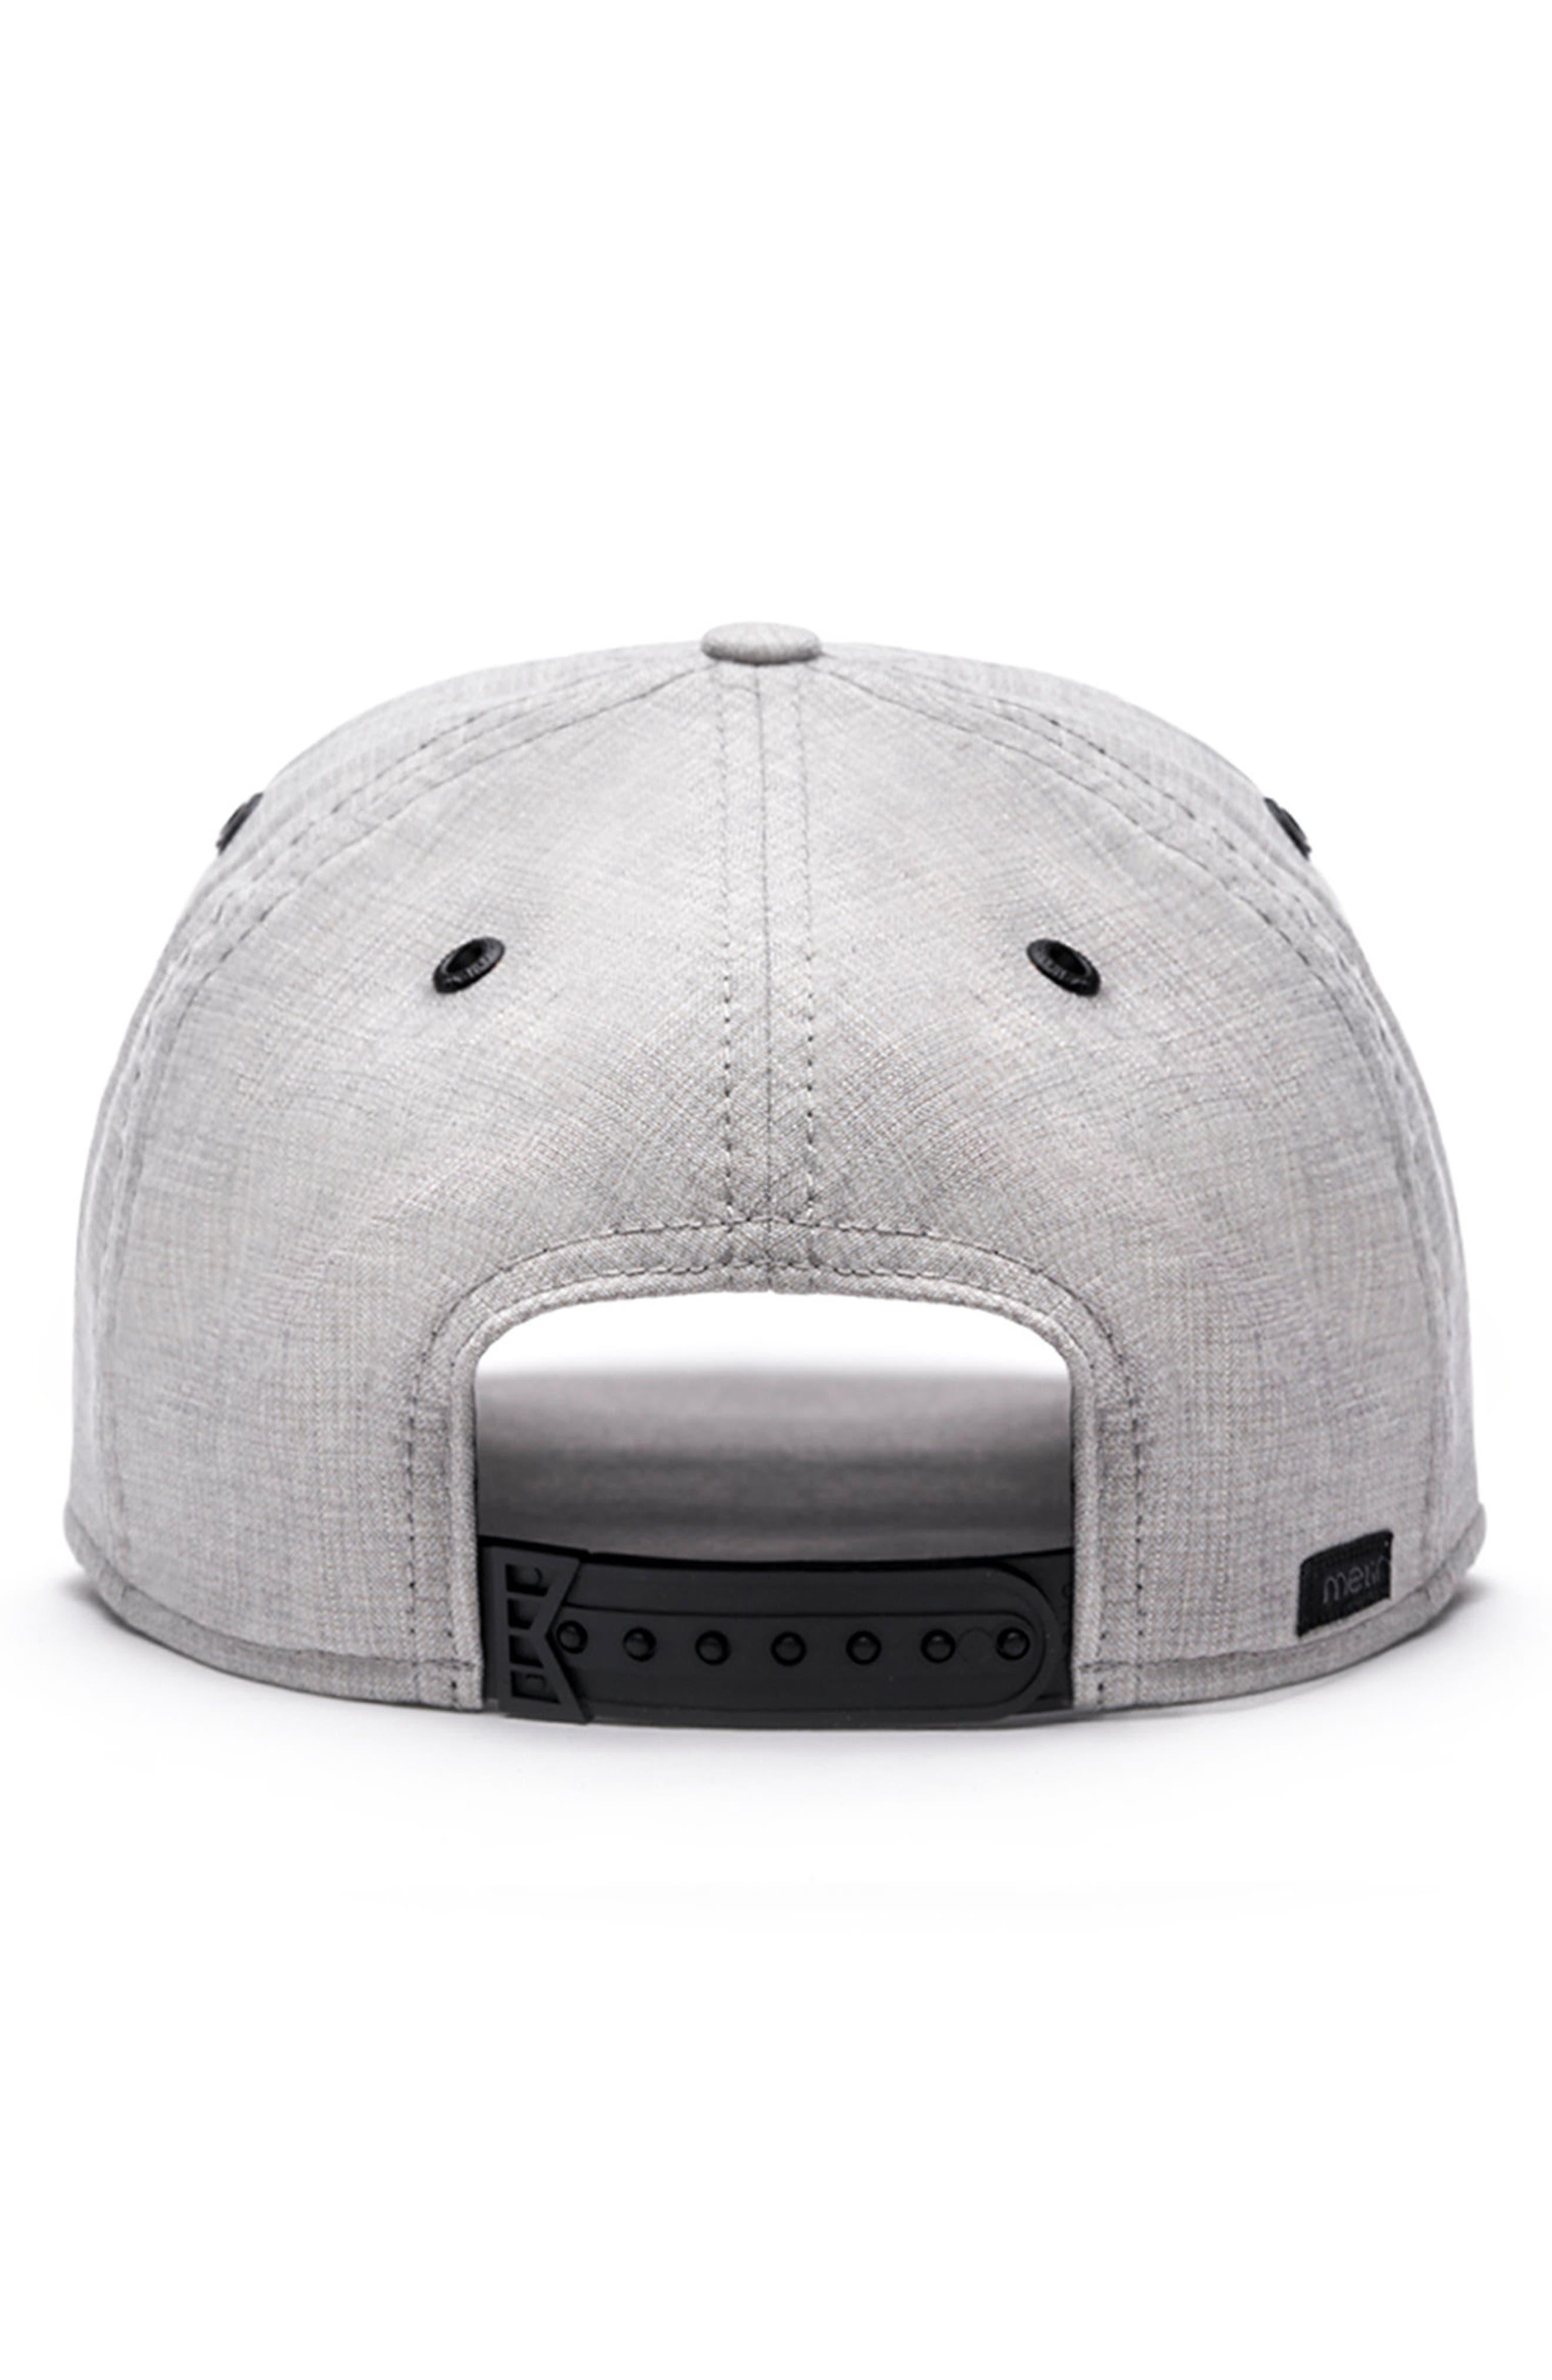 Odyssey Baseball Cap,                             Alternate thumbnail 3, color,                             Light Grey